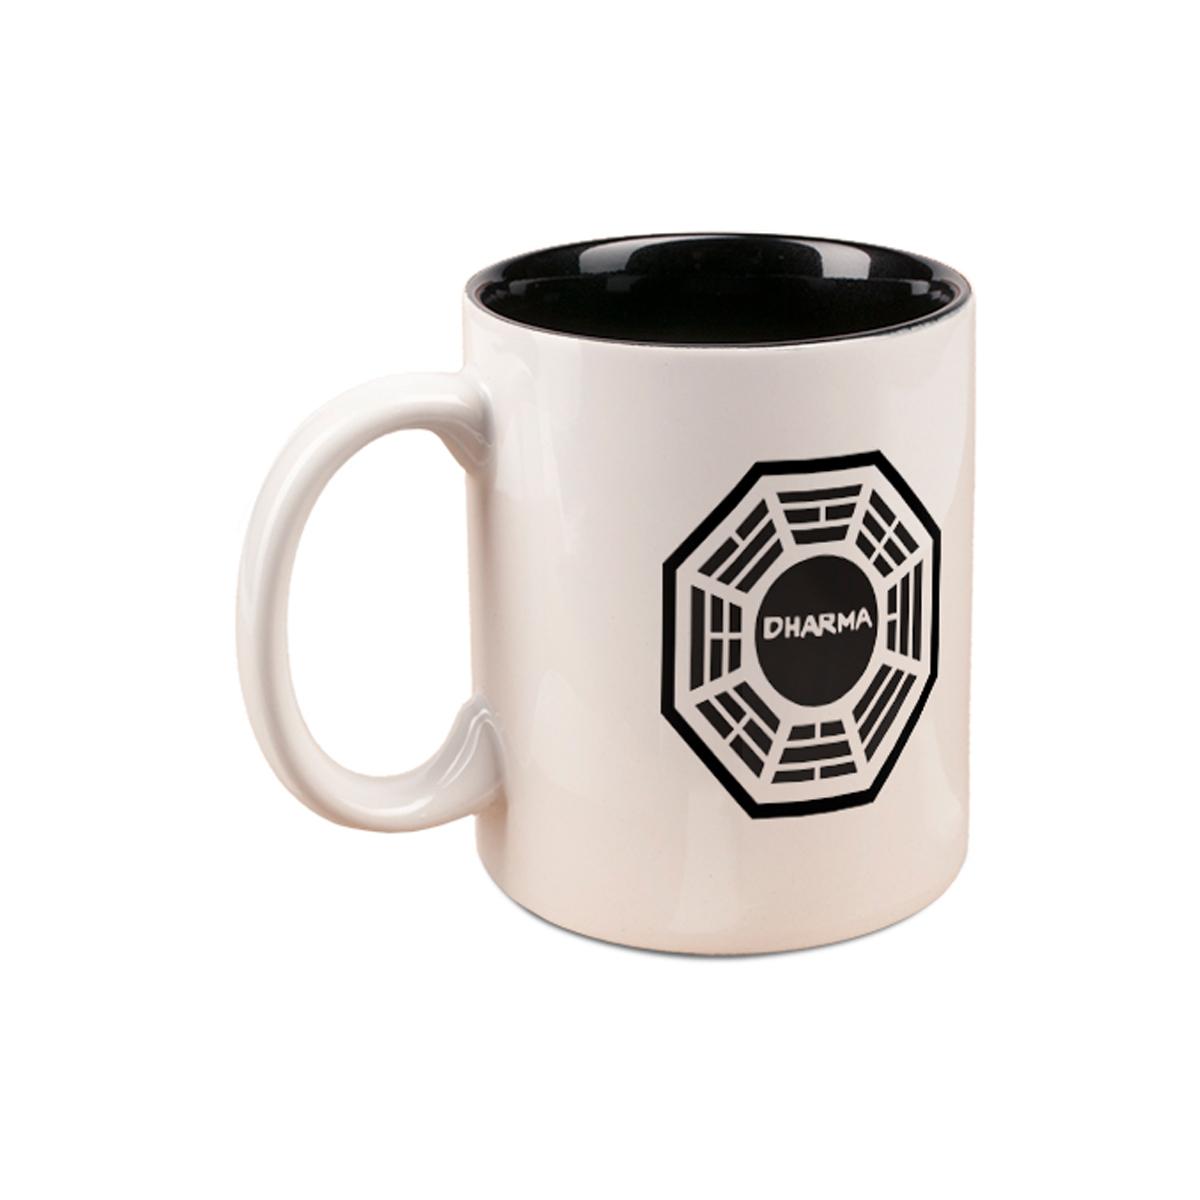 Lost Dharma Mug